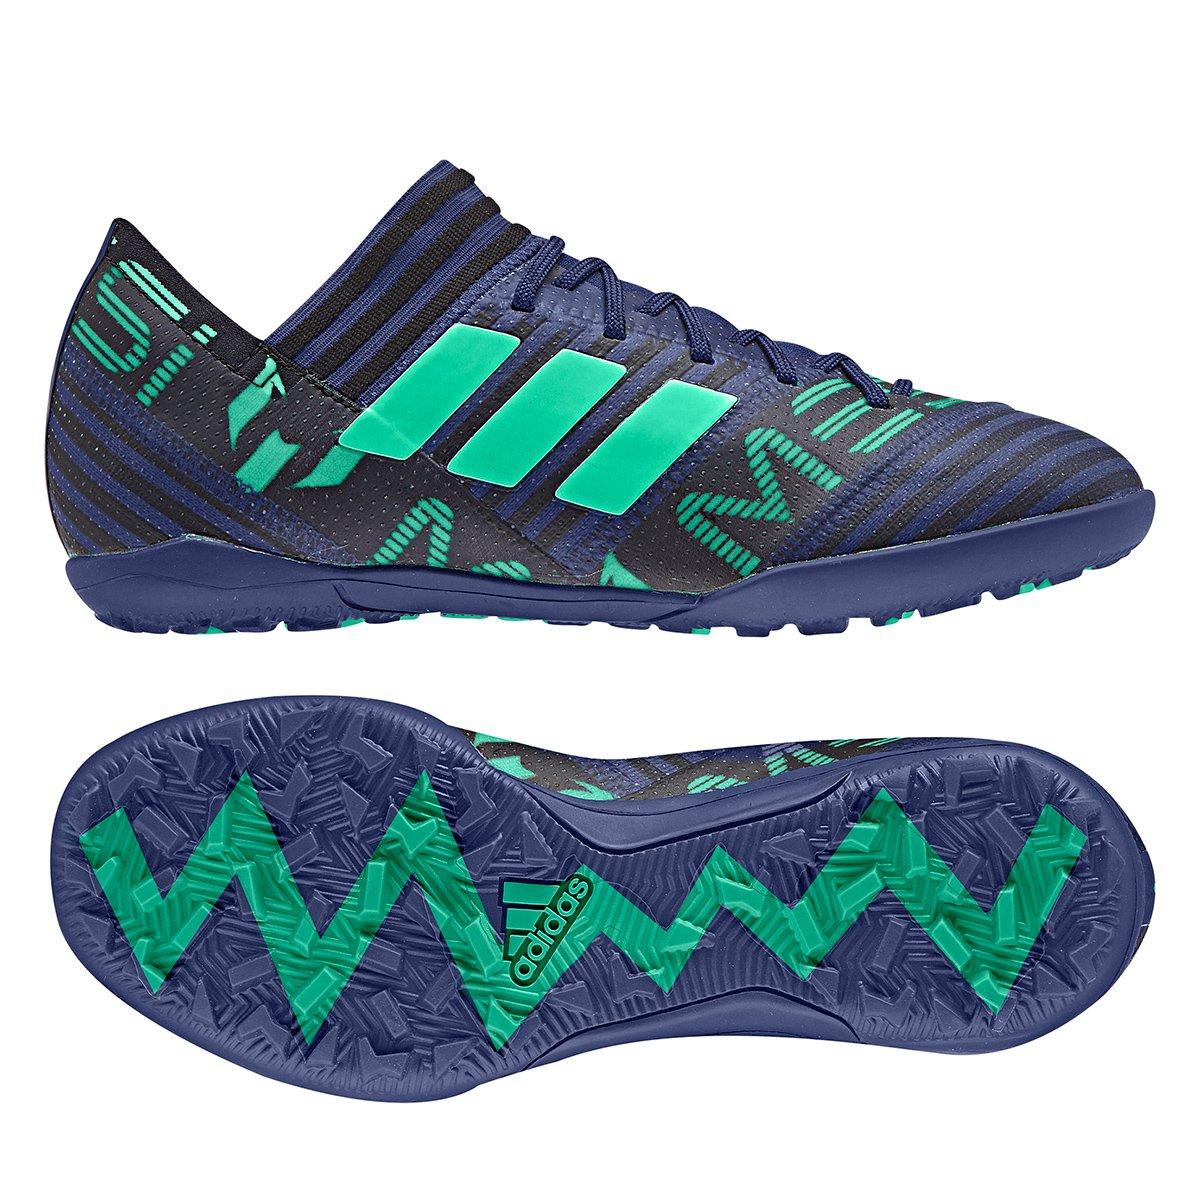 e6246f9355a Chuteira Society Adidas Nemeziz Messi 17 3 TF Infantil - Compre Agora